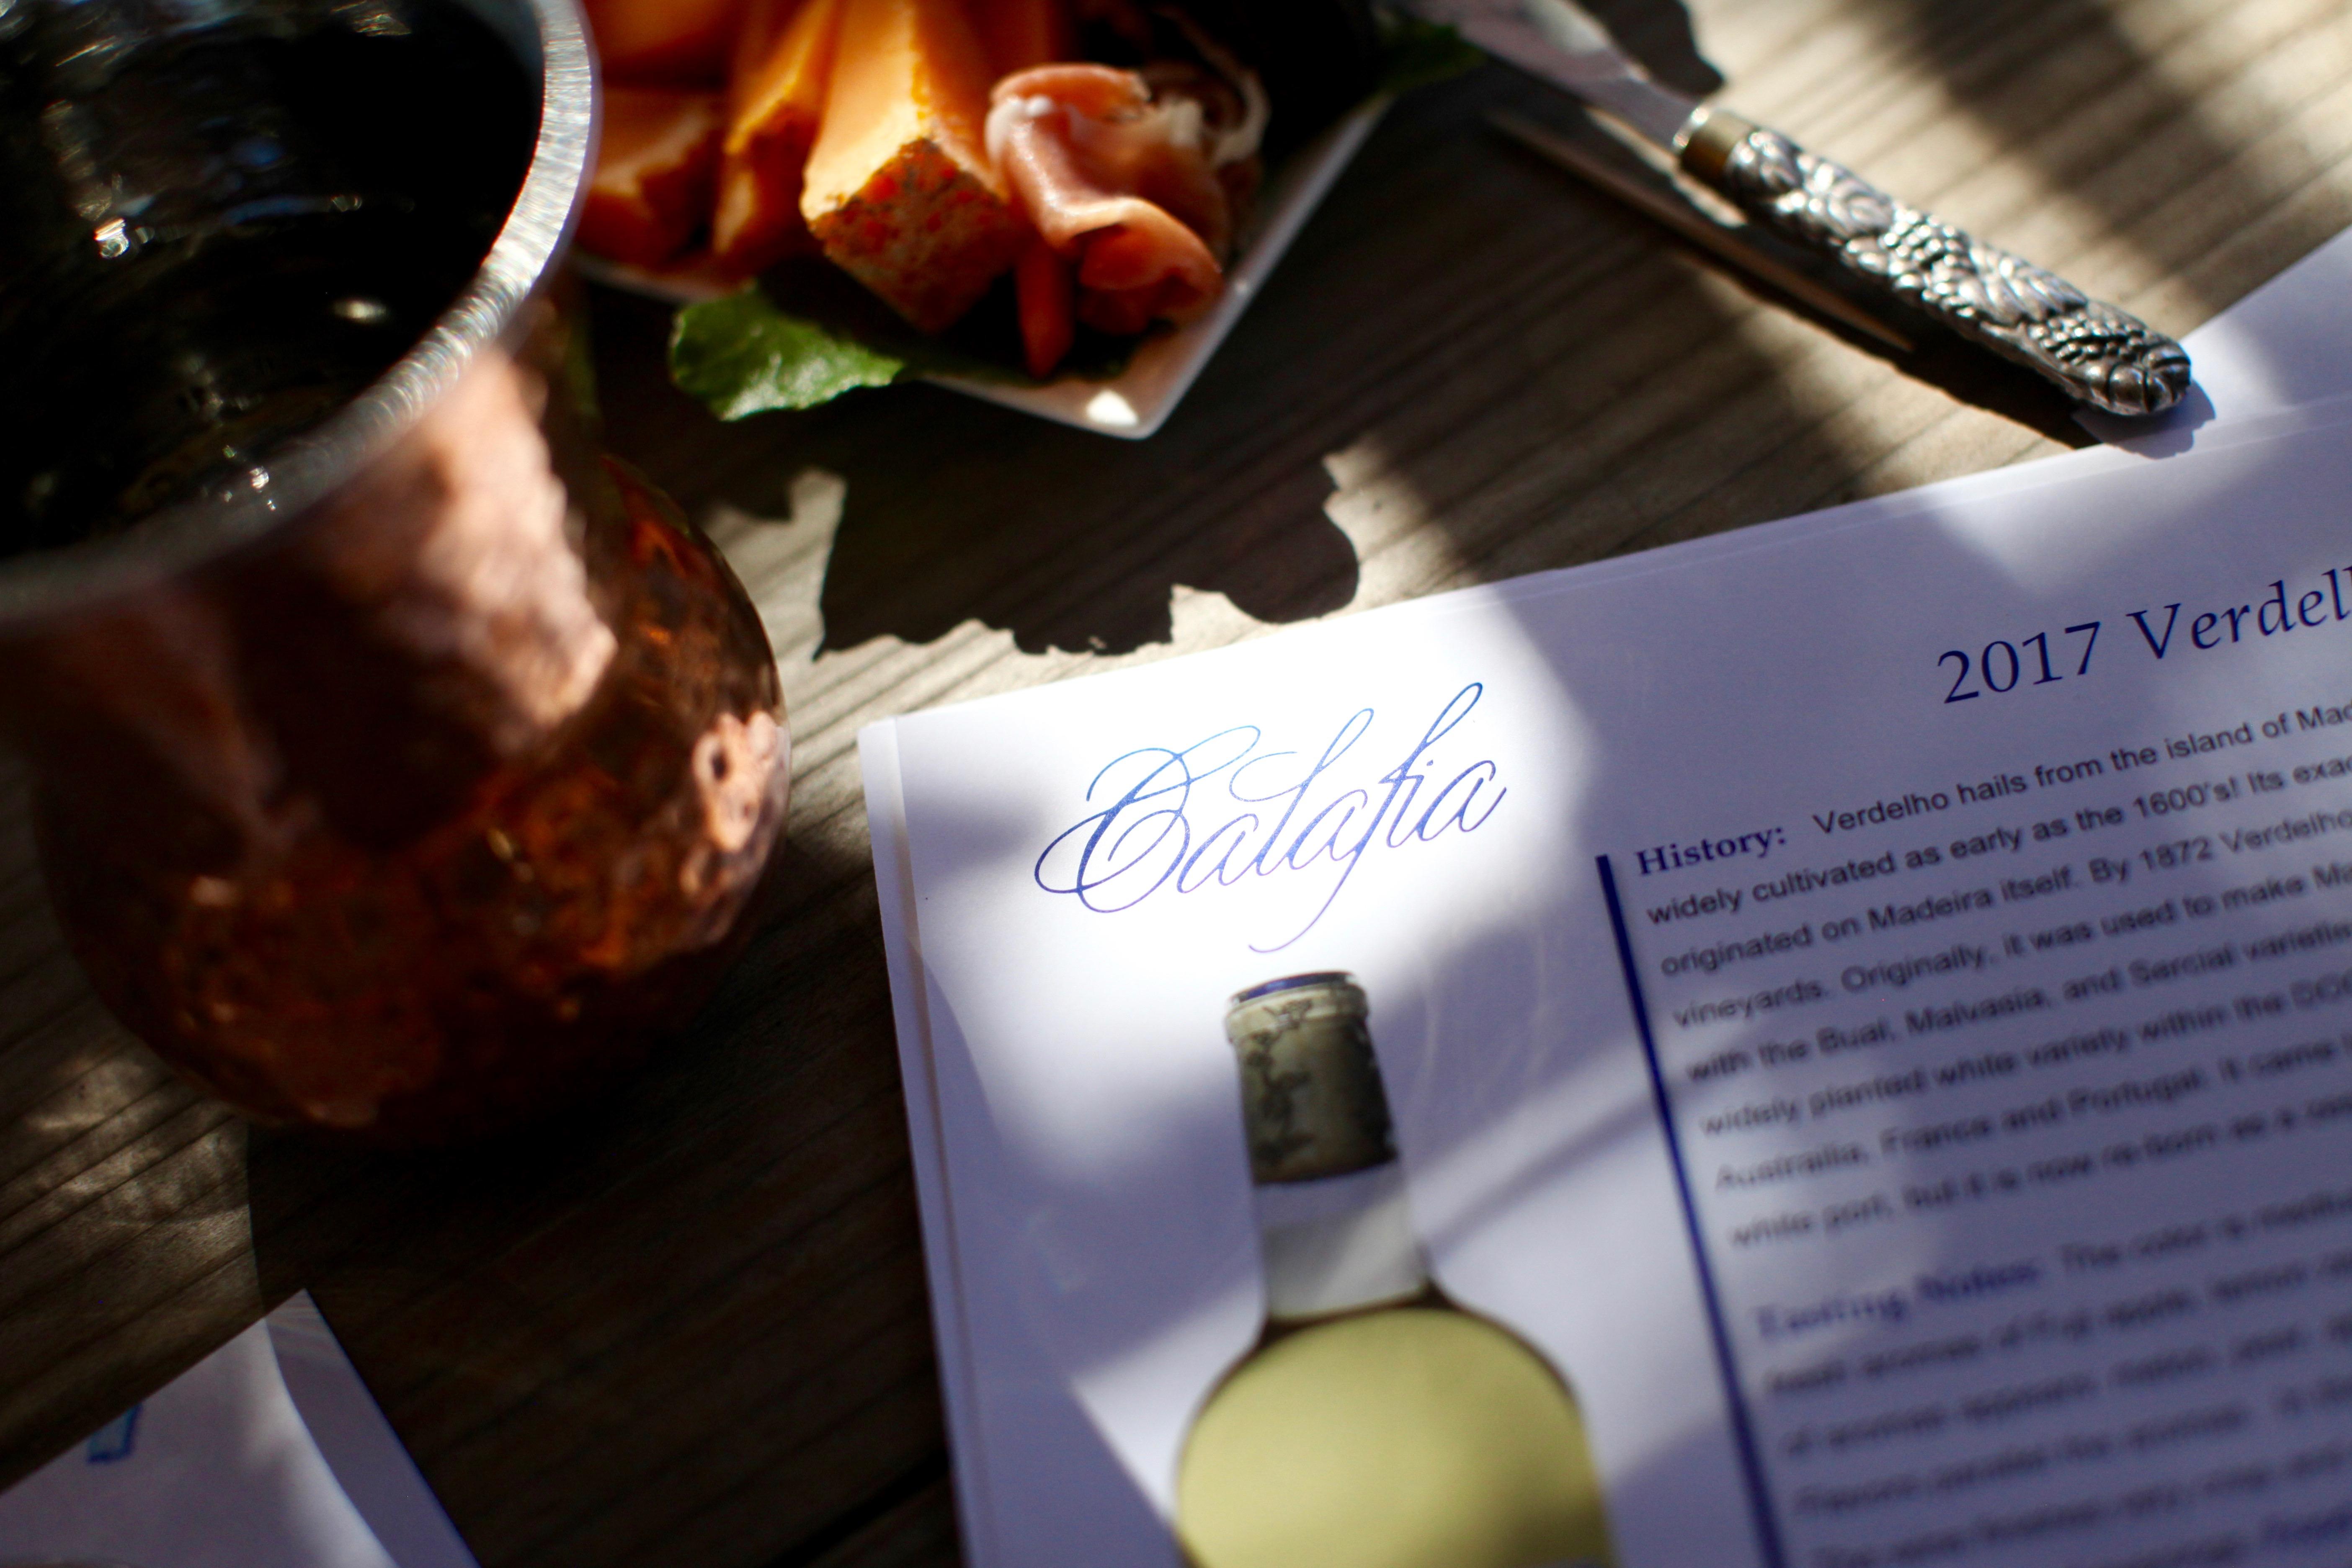 Table setting for tasting